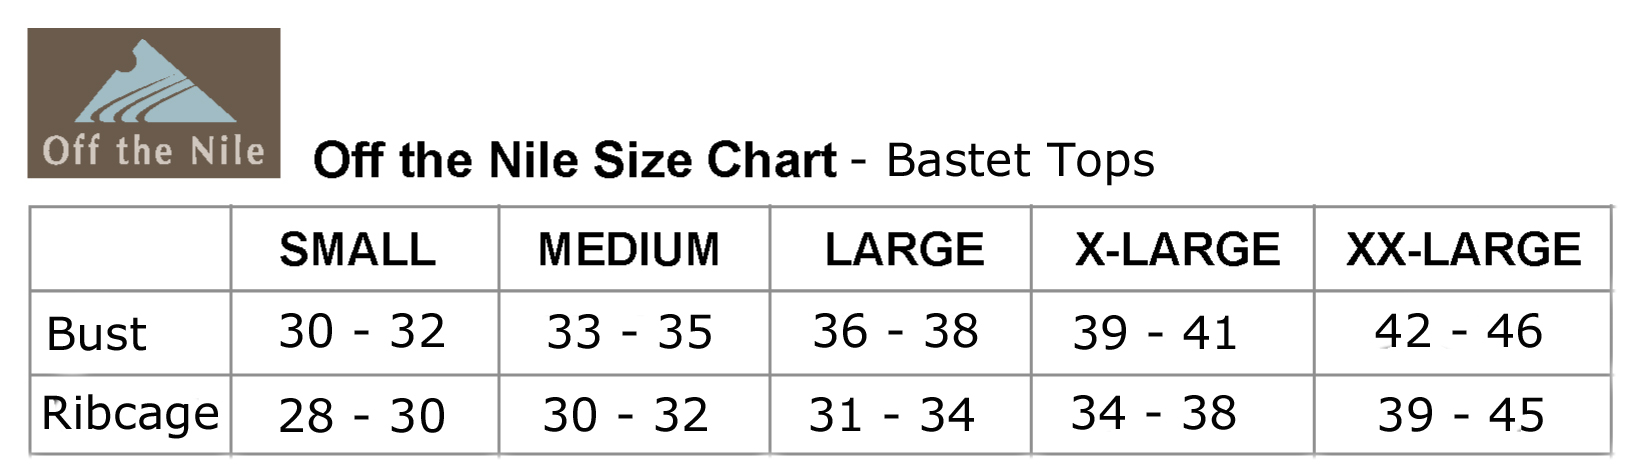 size-chart-bastet-tops.jpg